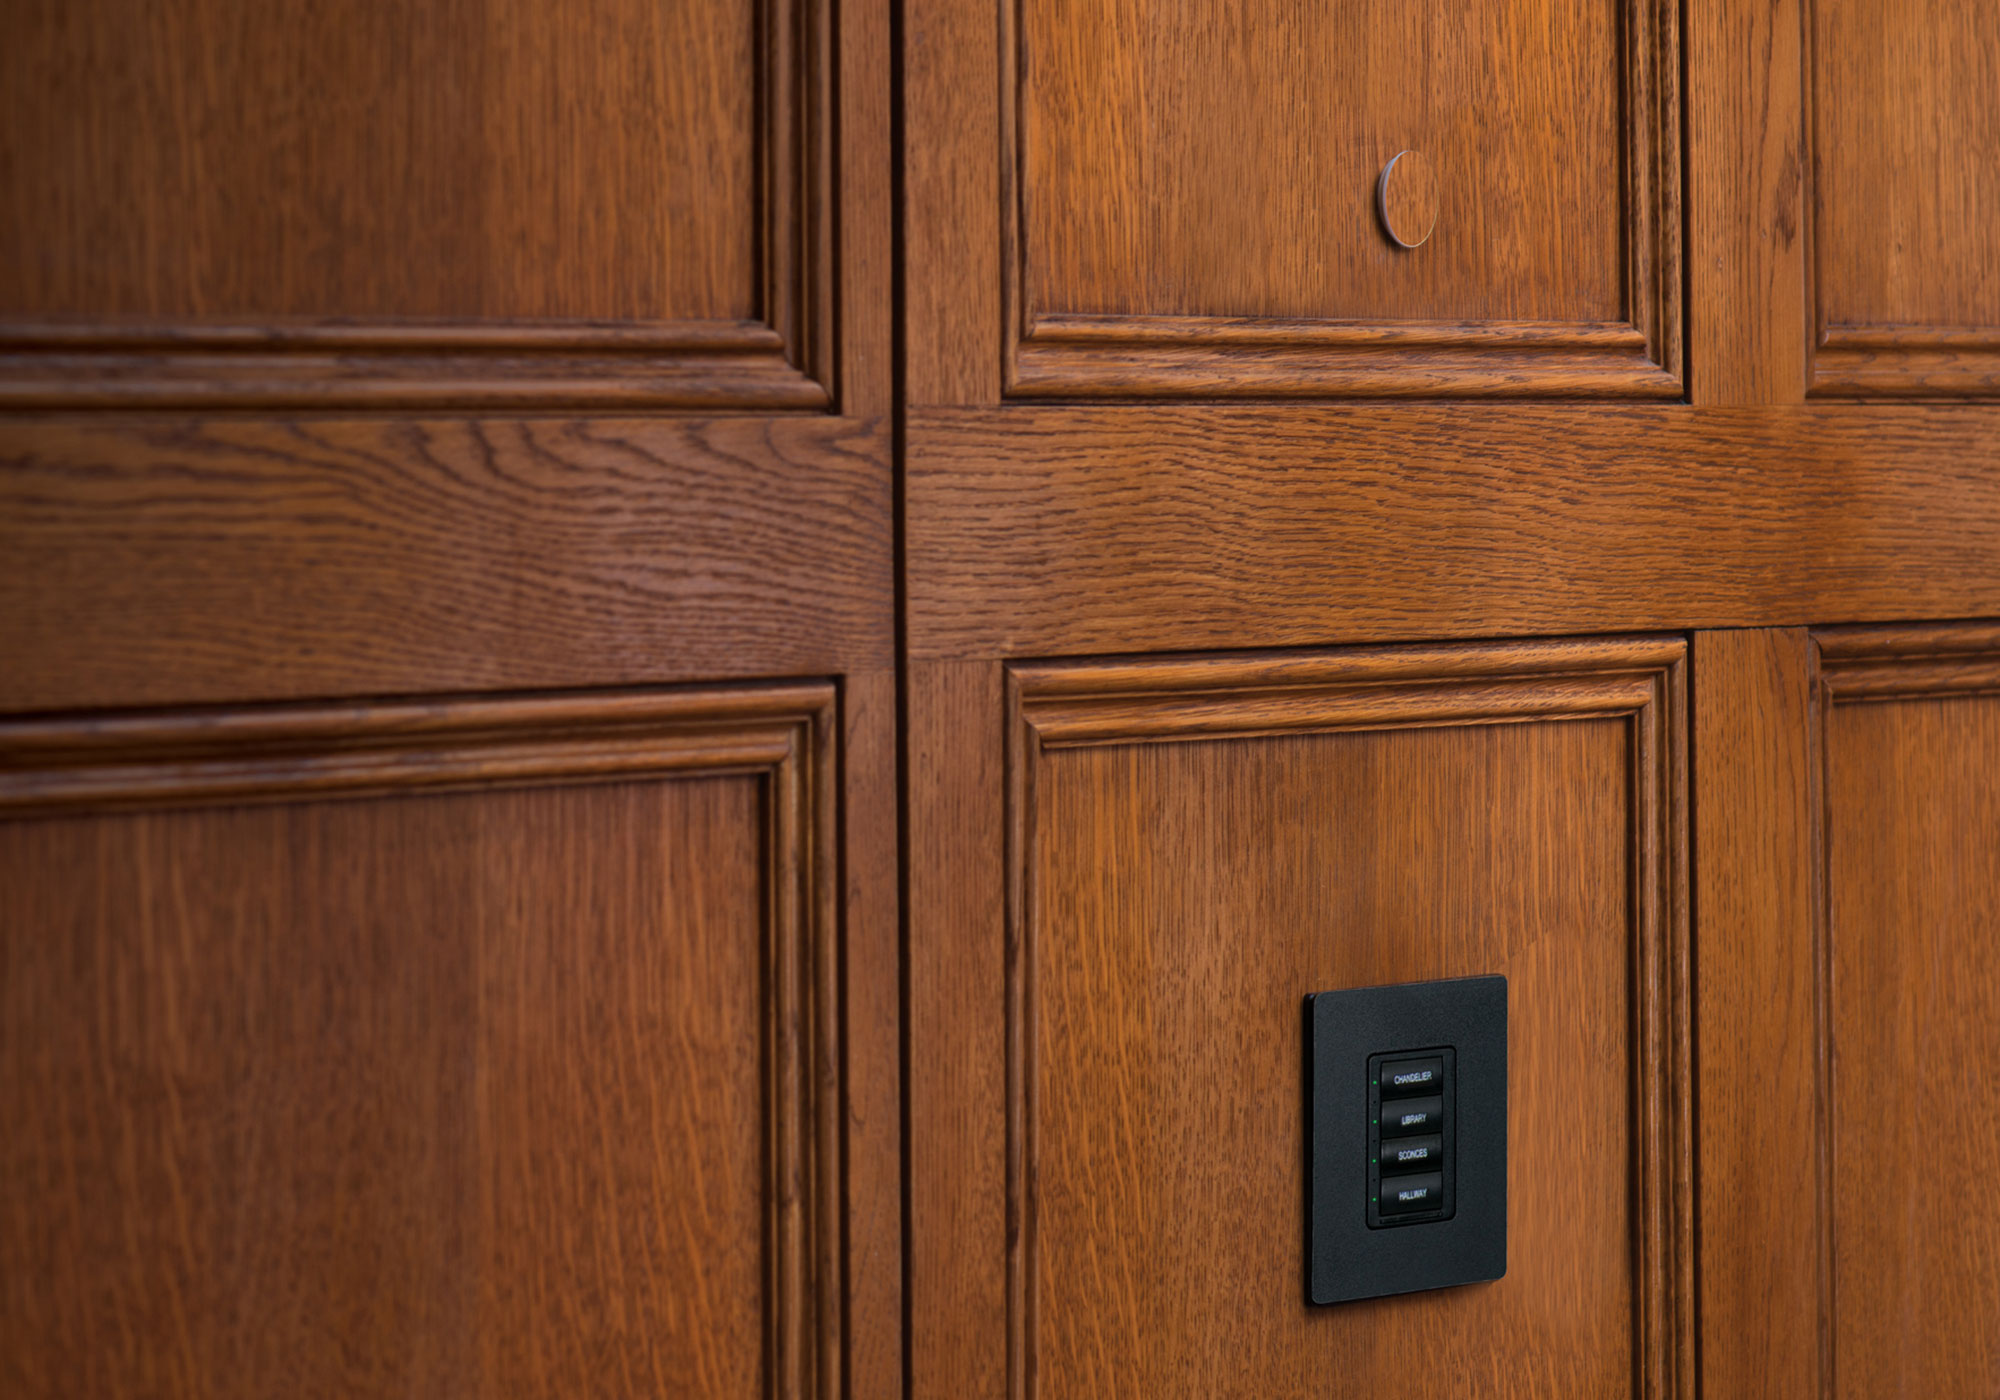 keypad, presets, remote sensor, wood, veneer